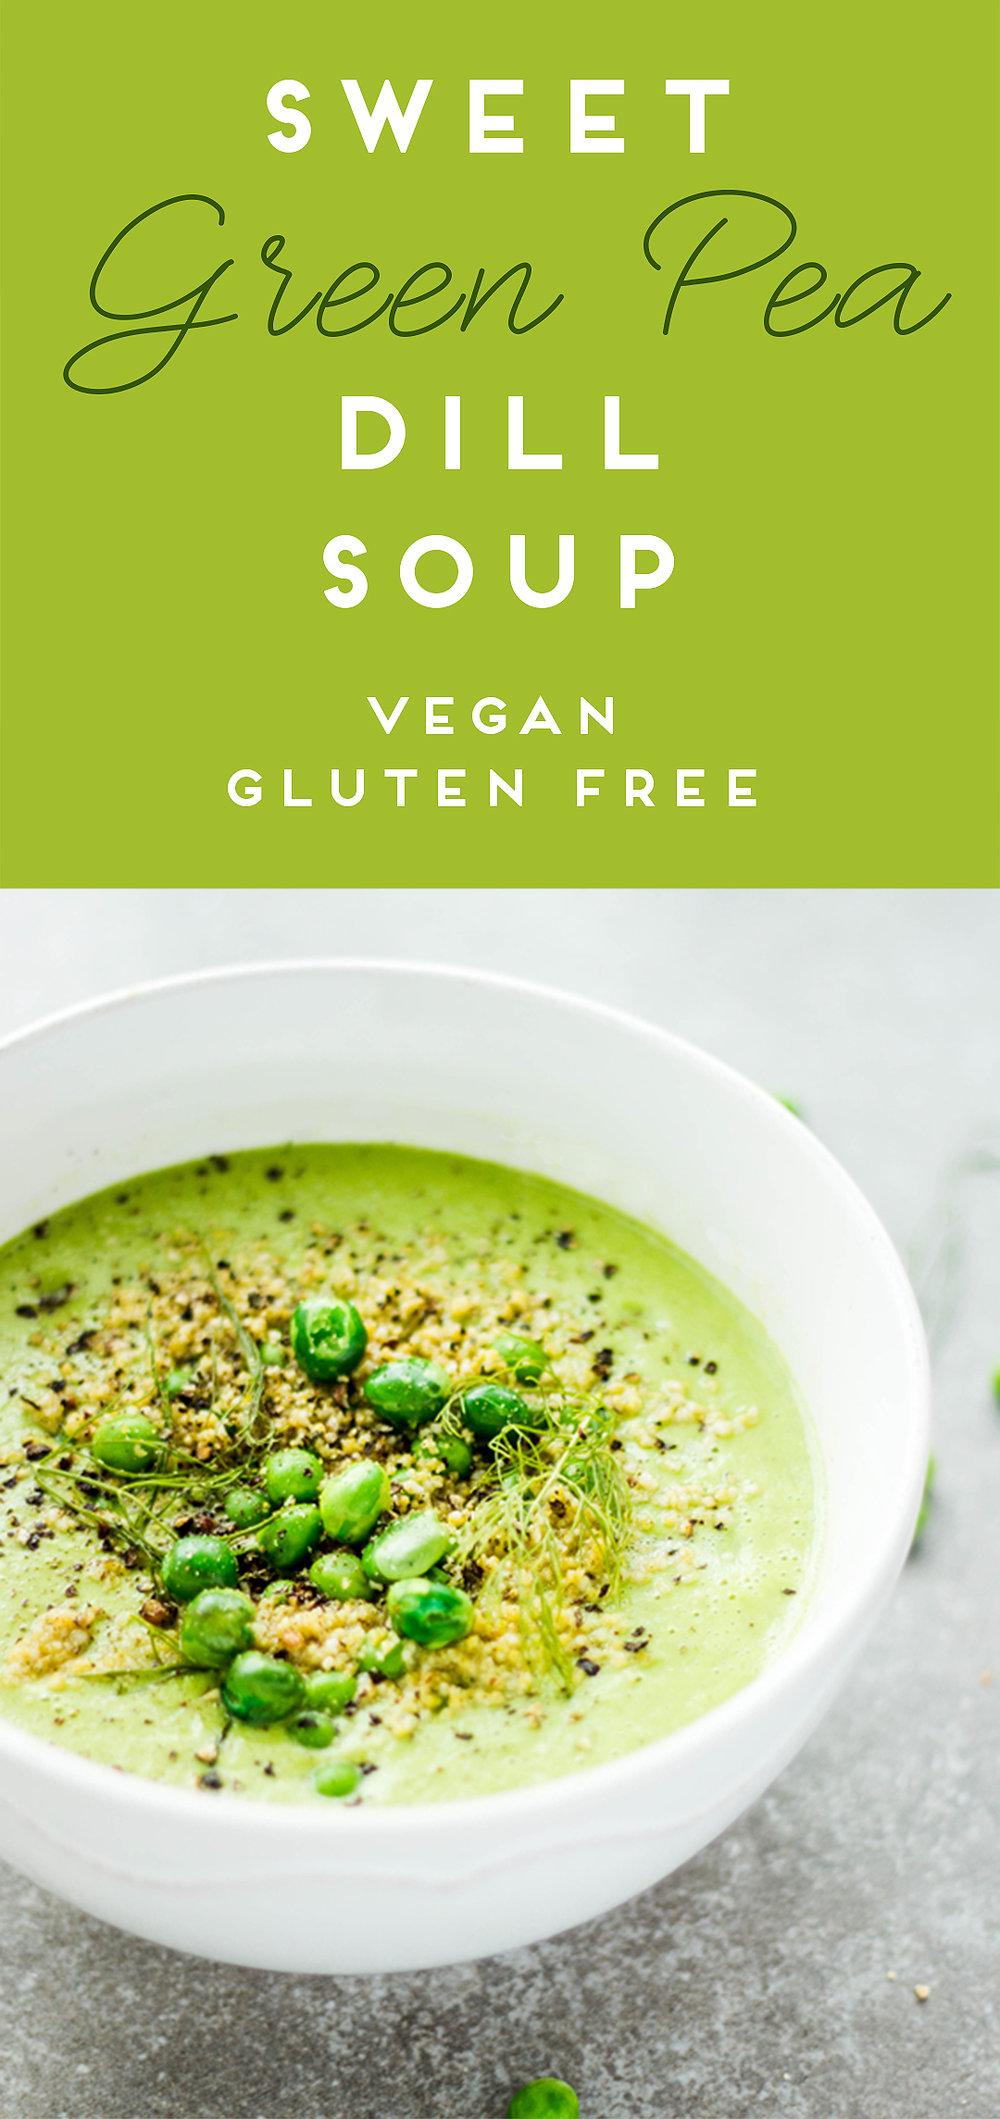 Sweet Green Pea Dill Soup